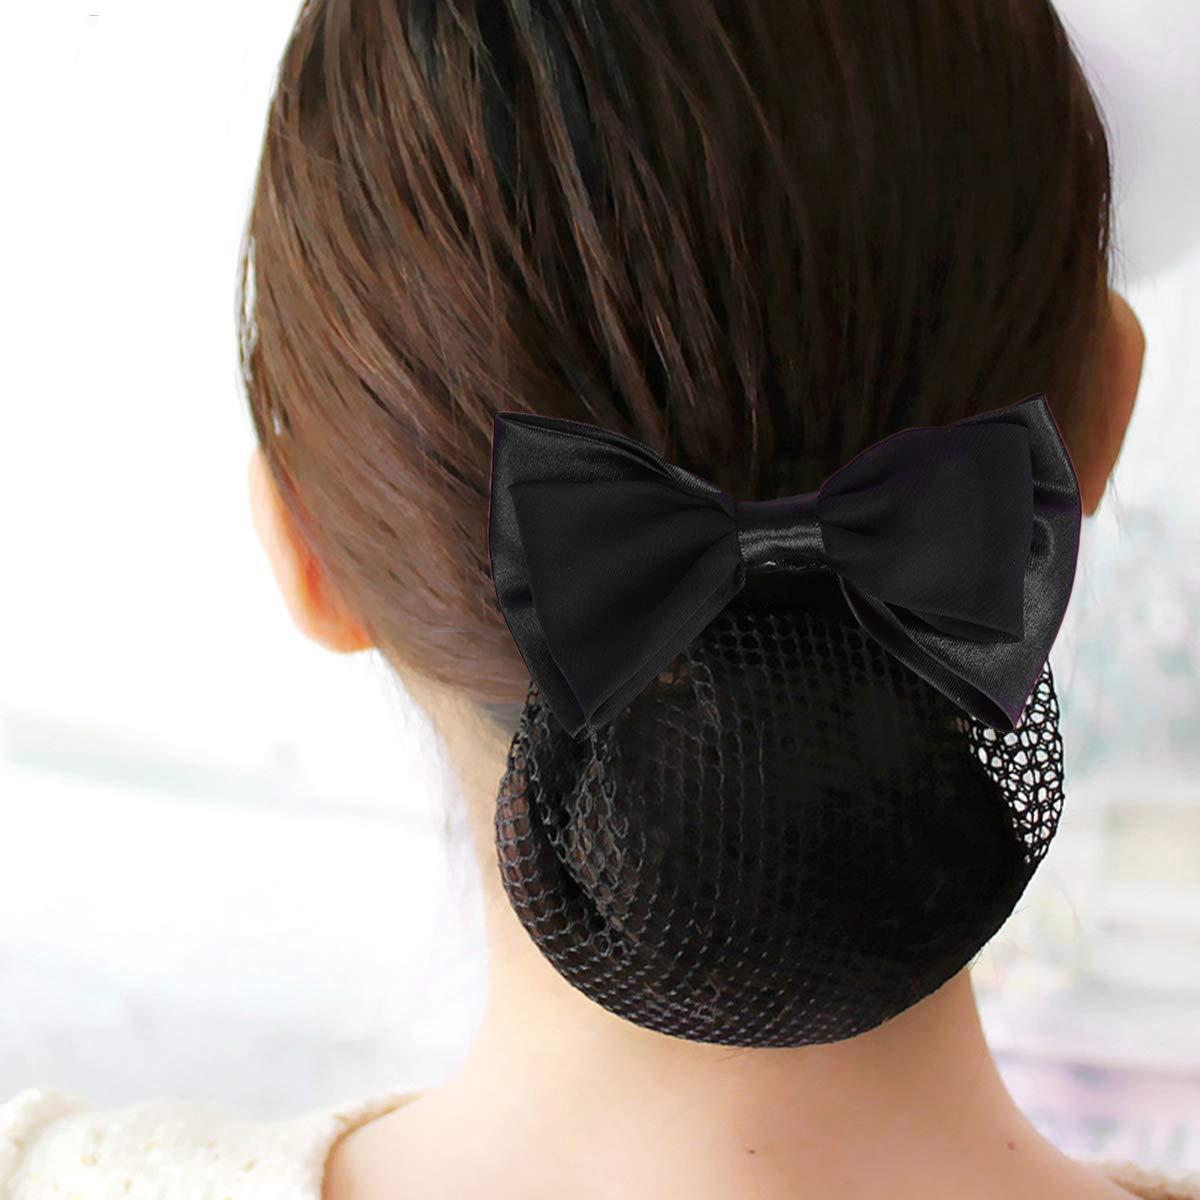 Beaupretty 2pcs Hair Snood Net Barrette Mesh Clip Elastic Butterfly Bun Bow Headdress for Lady Women Dance Office (Black)